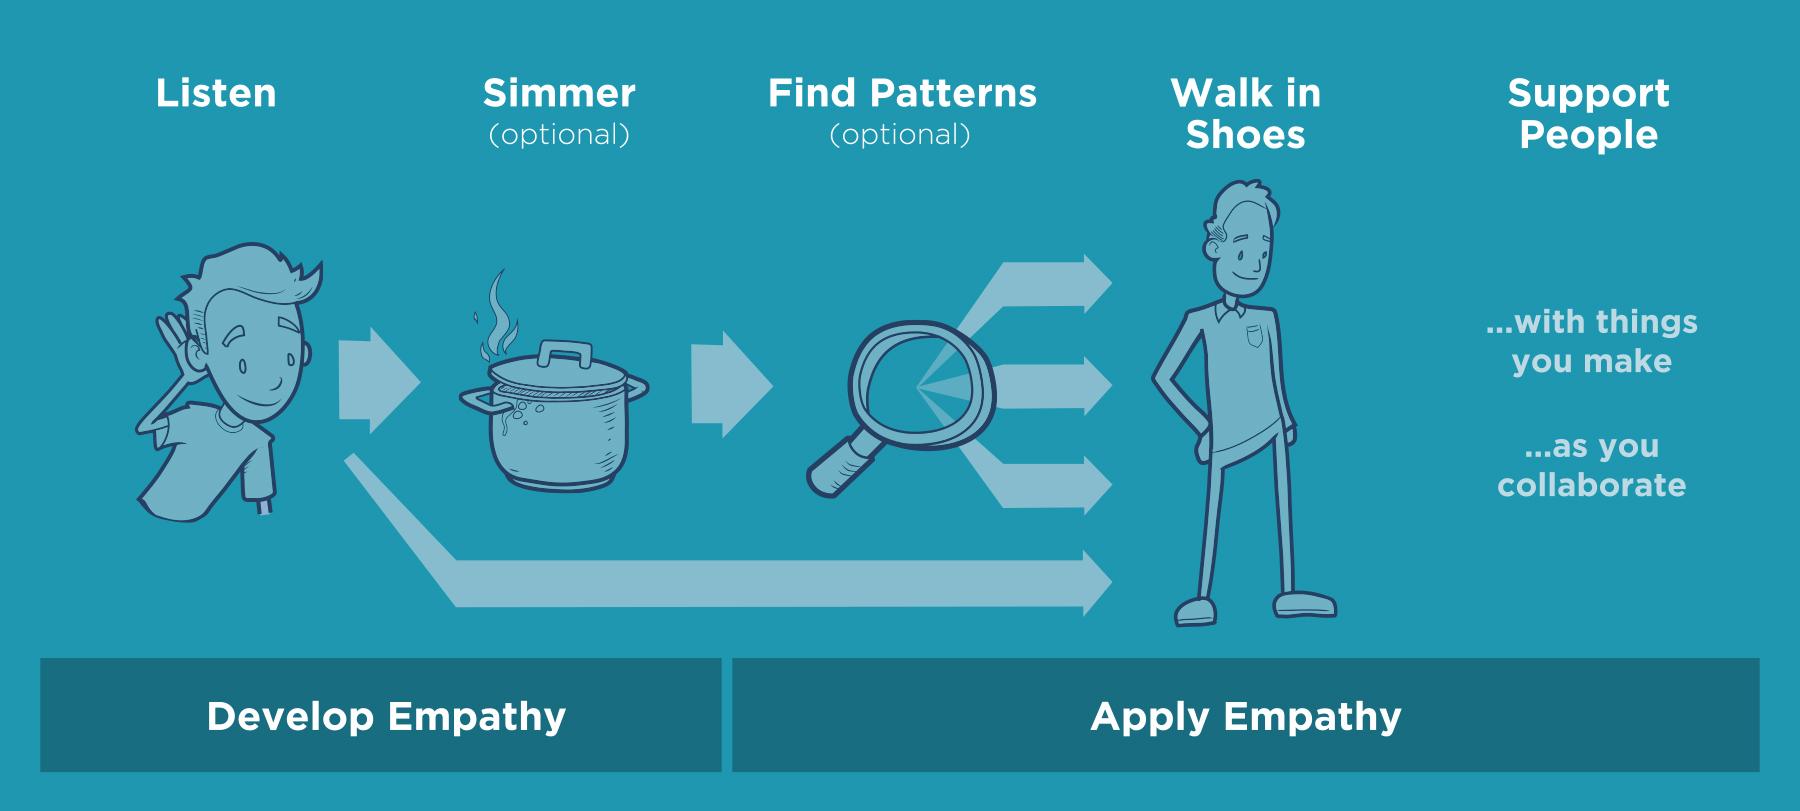 Listen - Simmer - Fid Patterns - Walk in Shoes - Support people